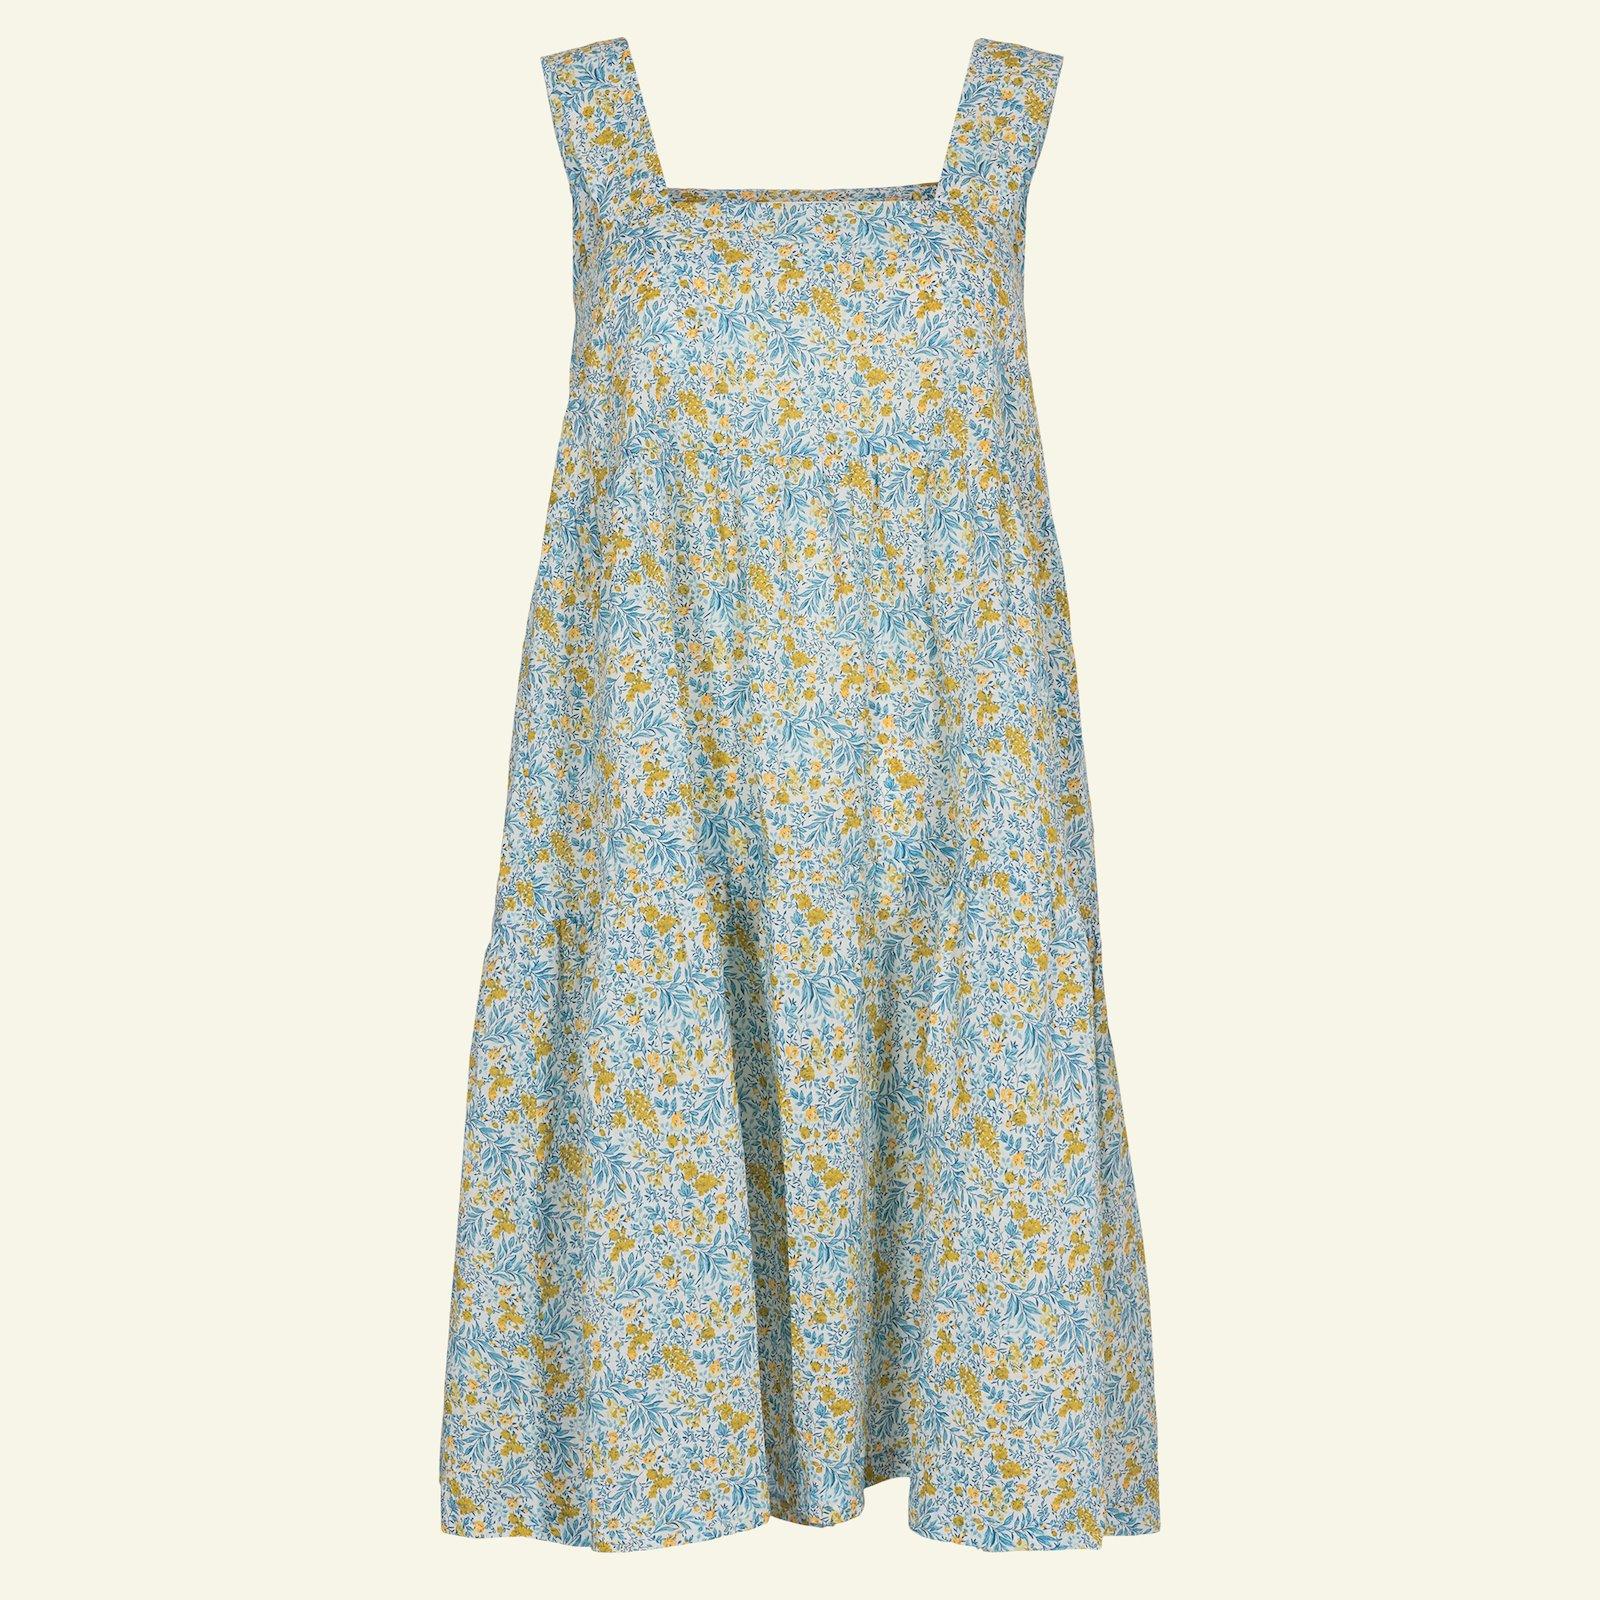 Babydoll dress, 36/8 p23168_580058_sskit